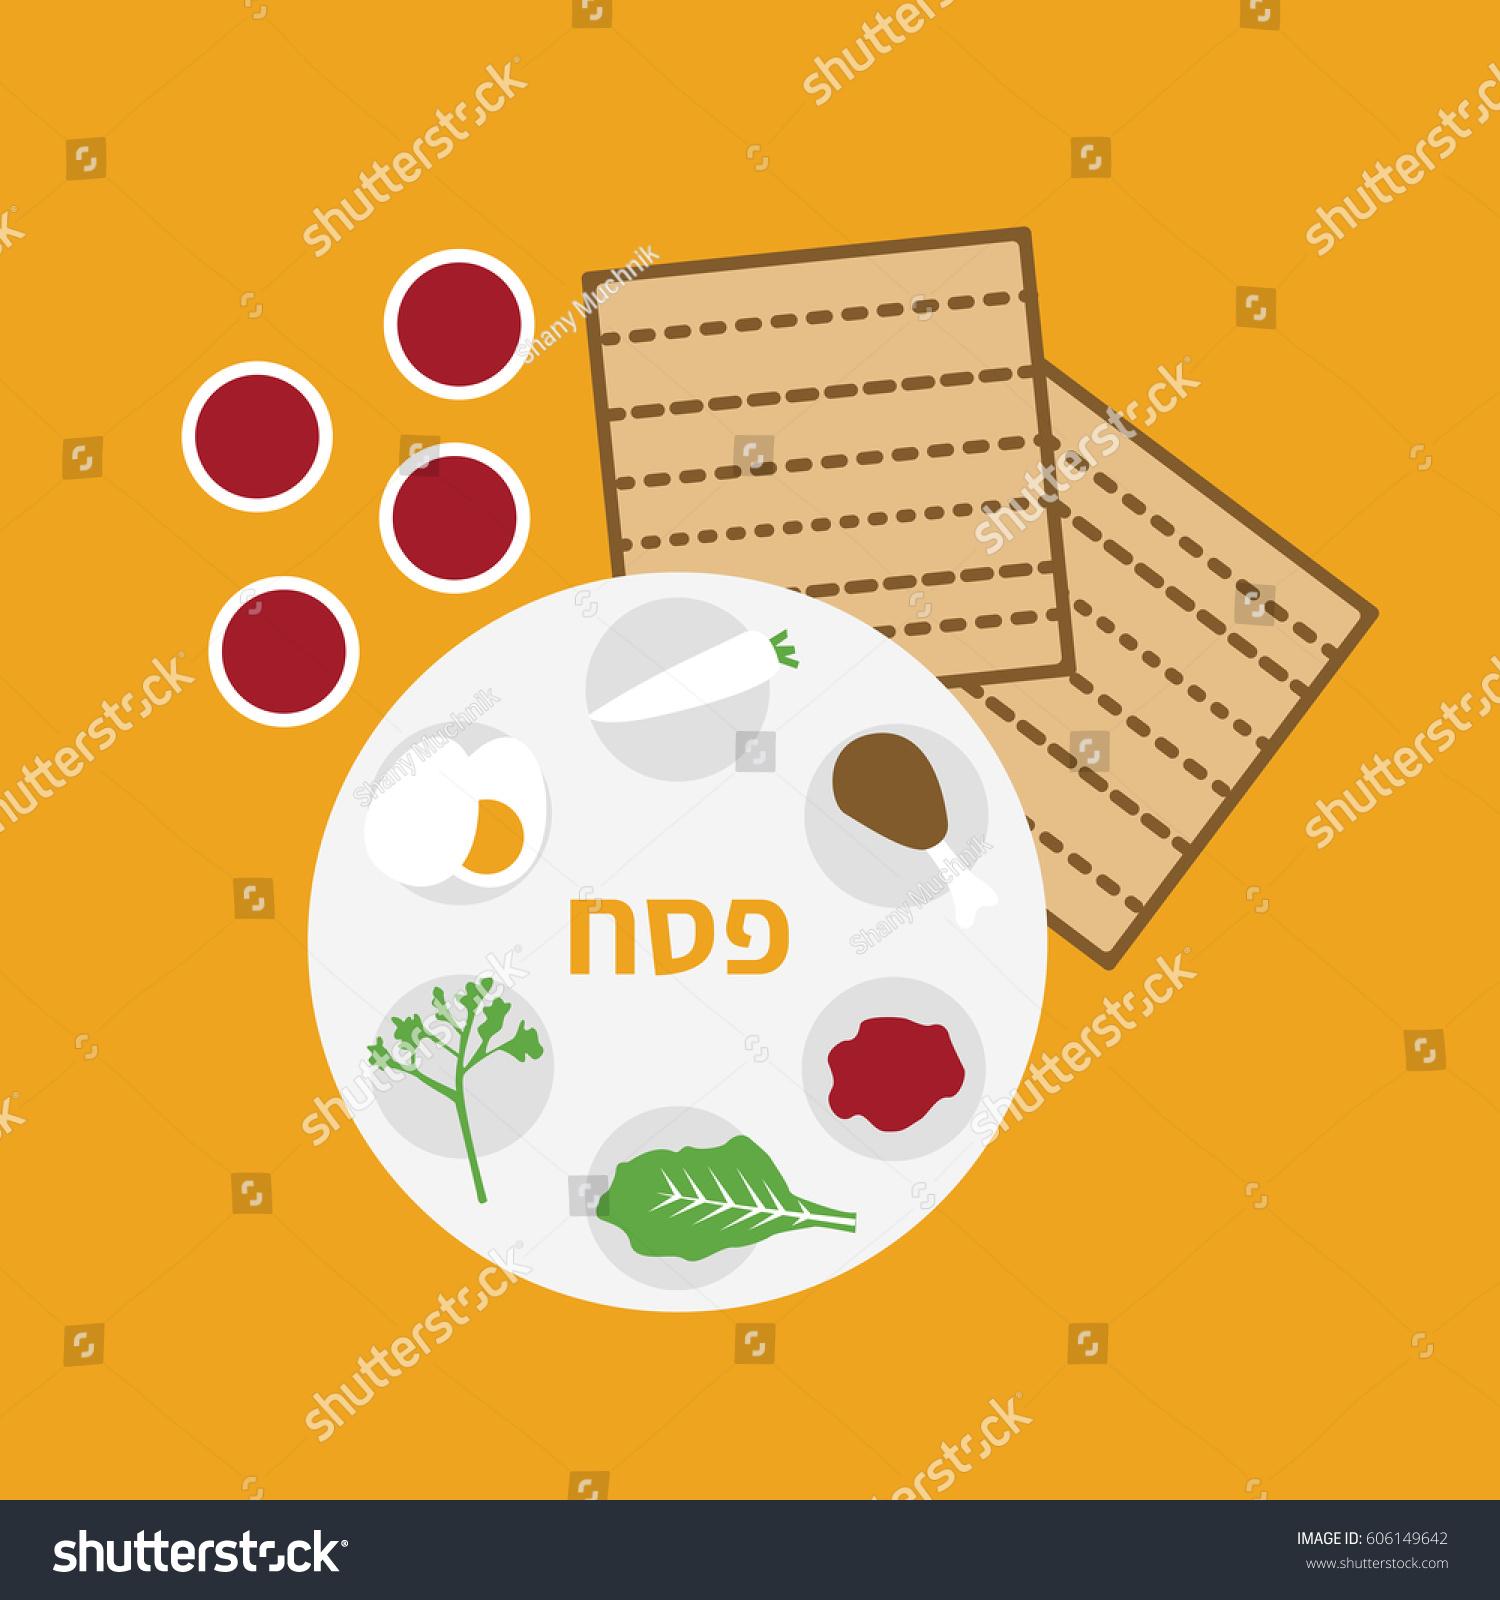 Passover seder kosher plate food flat stock vector 606149642 passover seder kosher plate food with flat design style traditional set icons symbols illustration vector buycottarizona